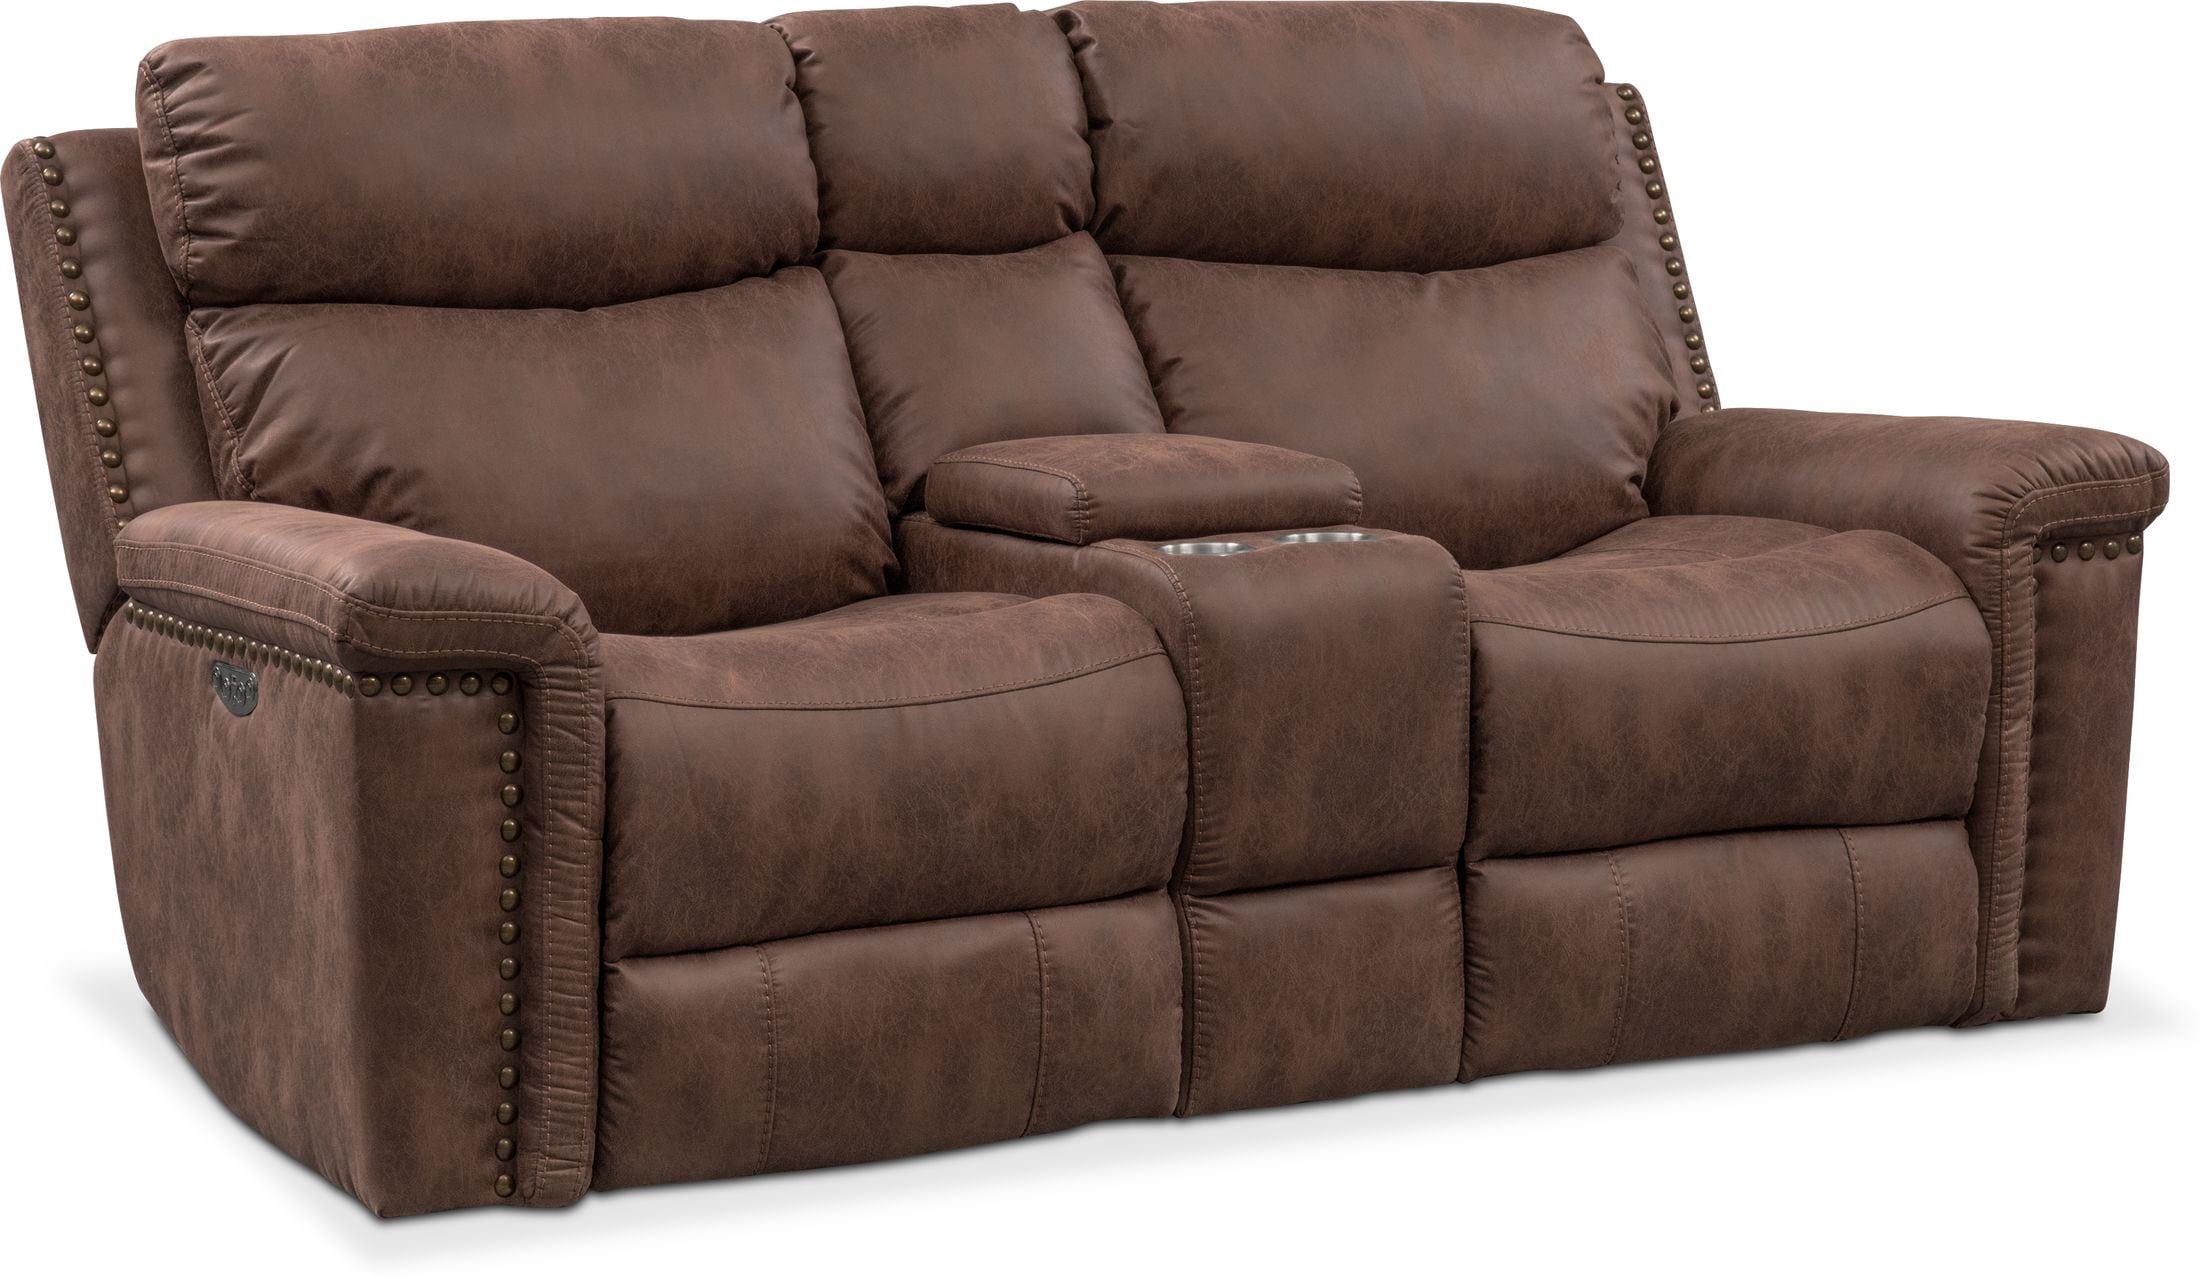 Living Room Furniture - Montana Dual-Power Reclining Loveseat